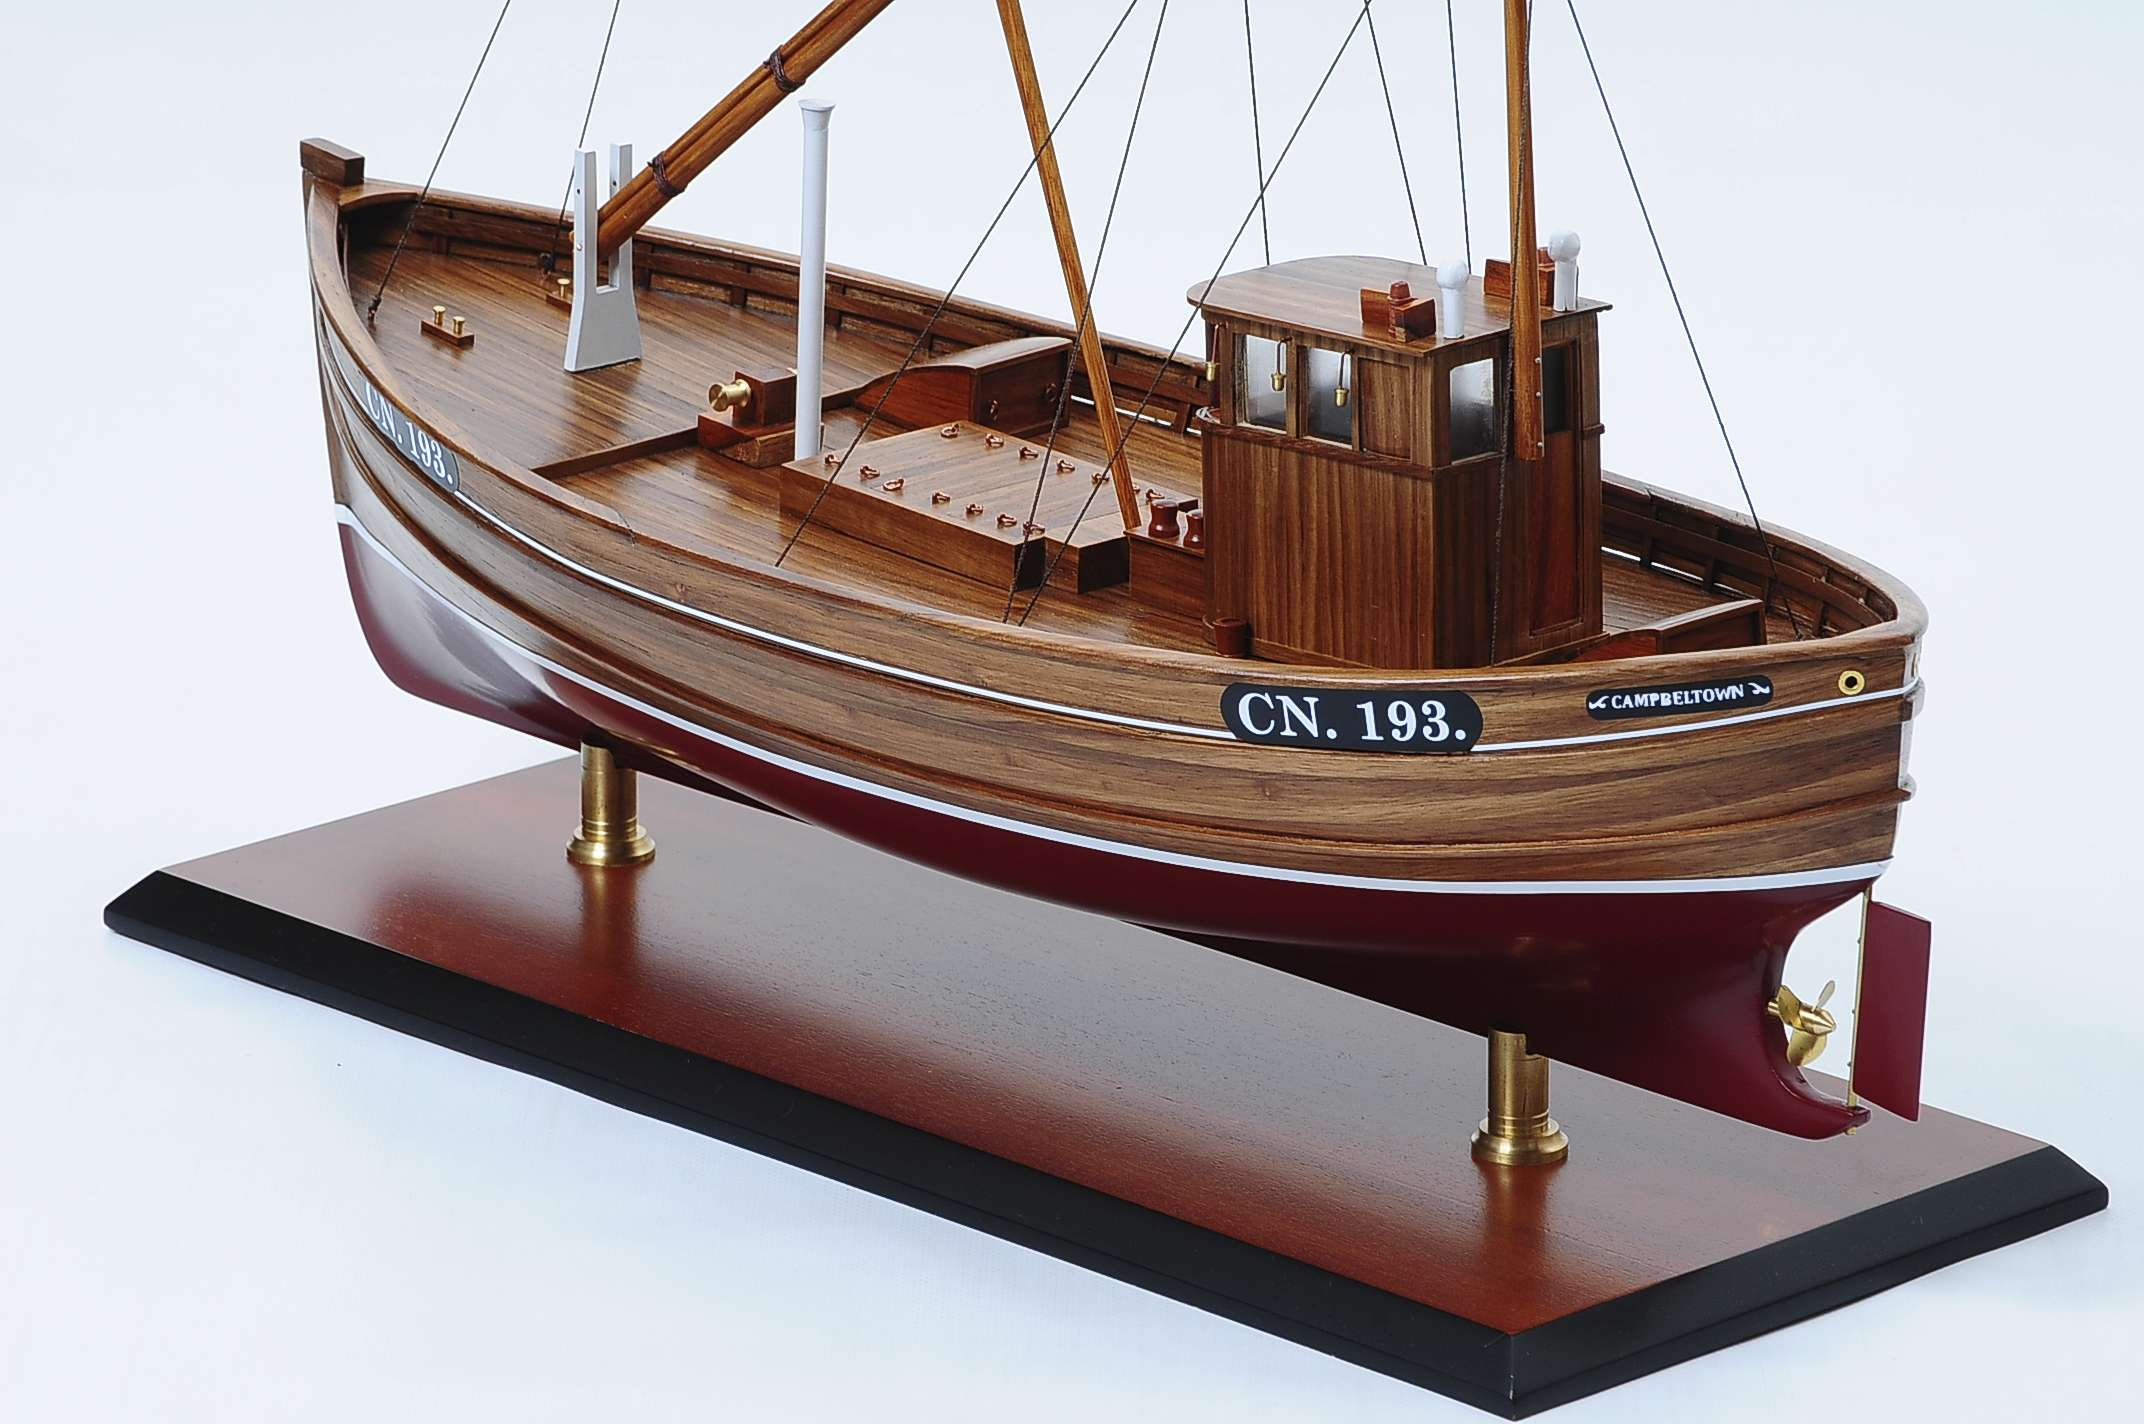 1431-4557-Mary-Mclean-CN193-Model-Boat